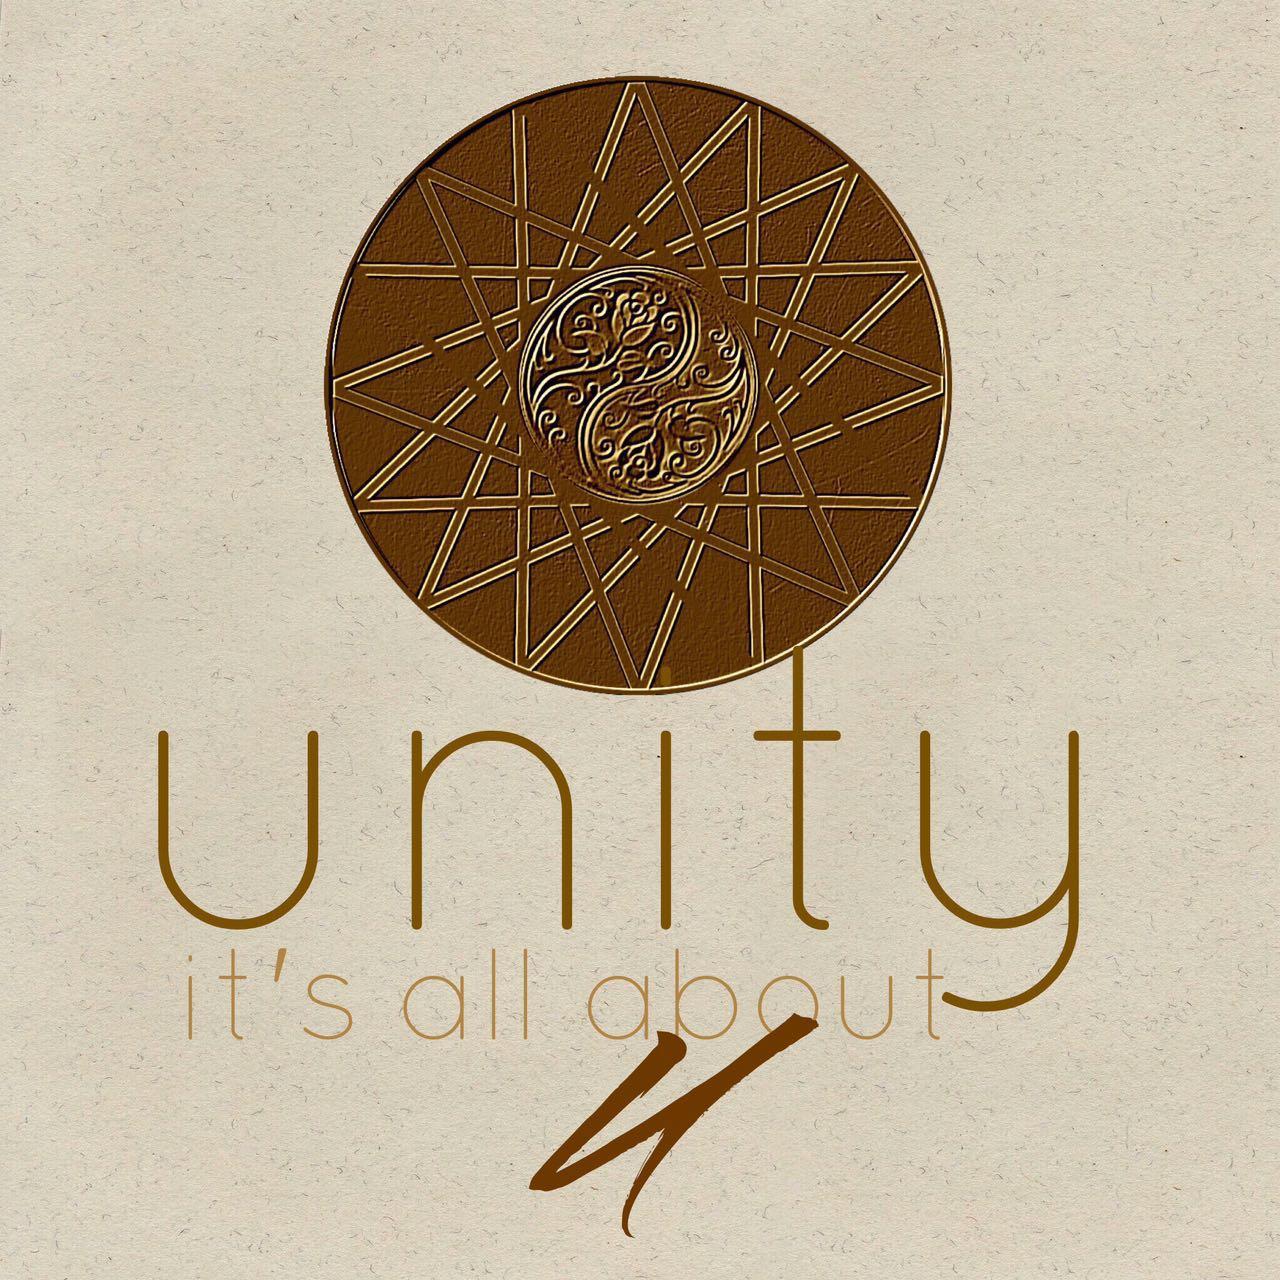 LOGO - Unity by Lotus